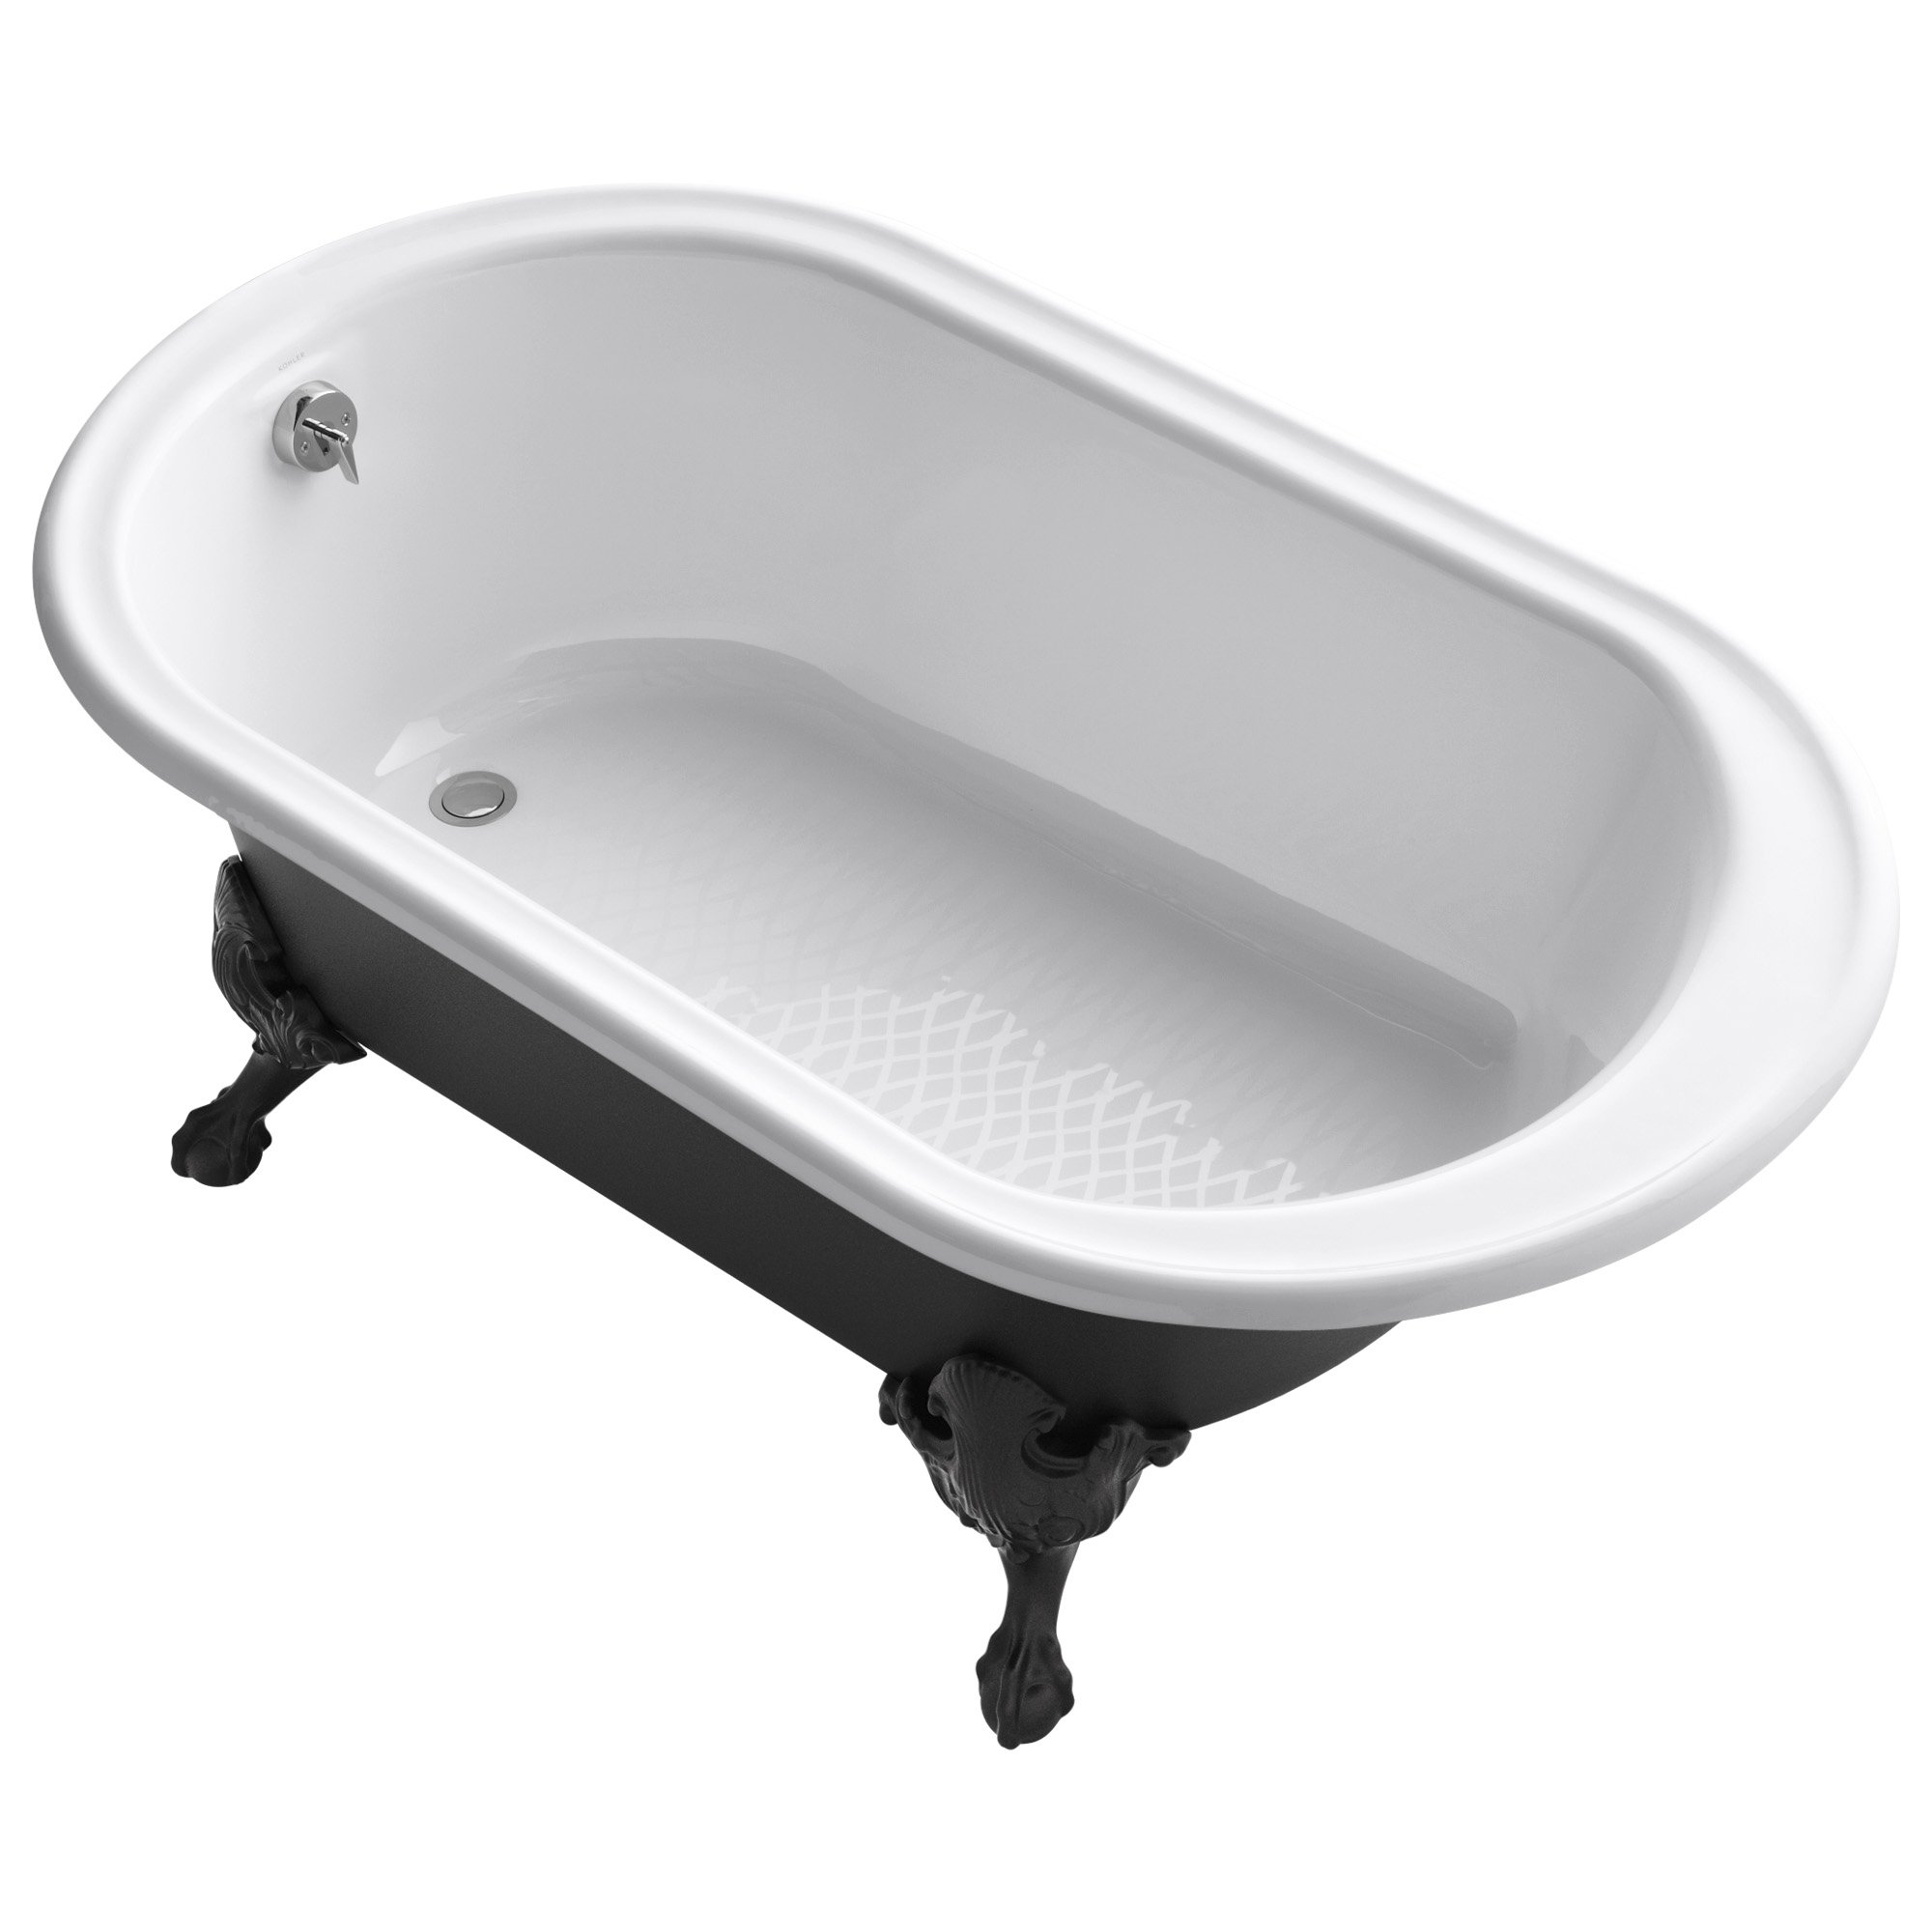 KOHLER K-710-P5-0 Iron Works Historic freestanding oval bath with reversible drain, Iron Black exterior & Safeguard finish, 66'' x 36'', White